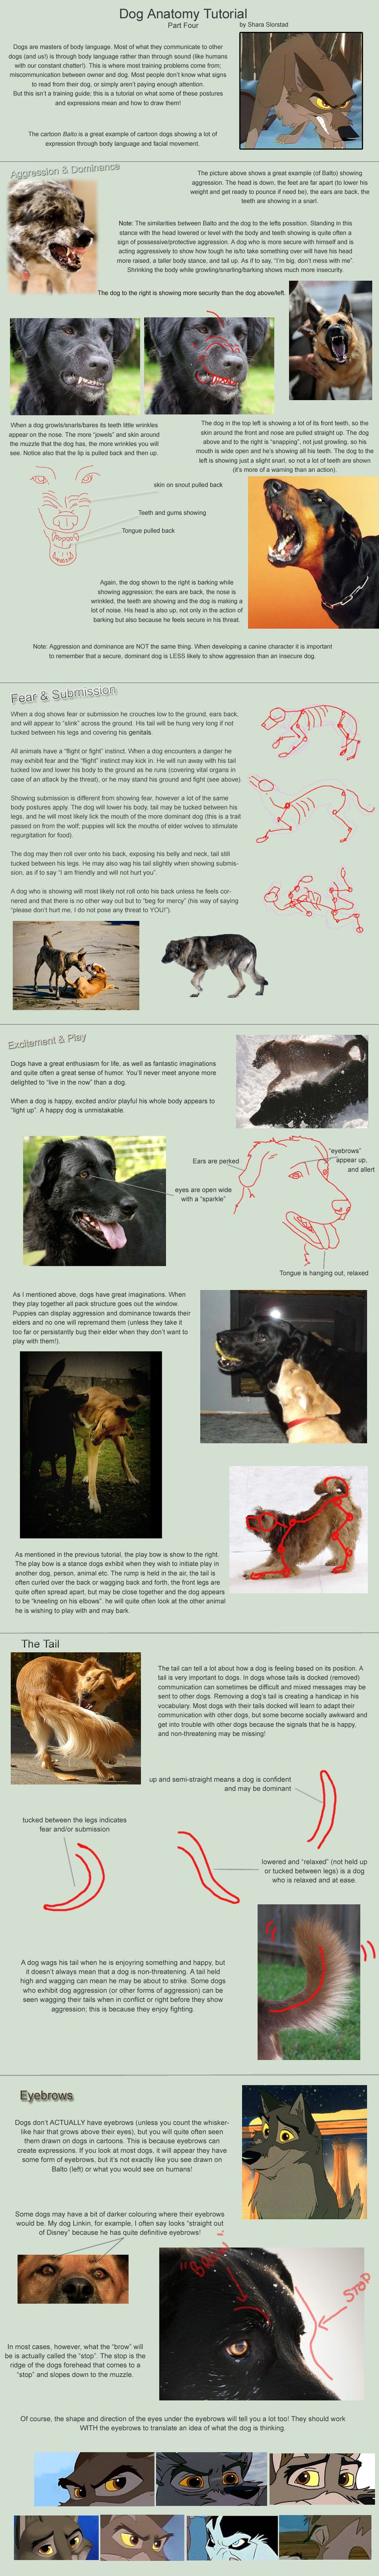 Dog Anatomy Tutorial 4 by SleepingDeadGirl.deviantart.com on @deviantART